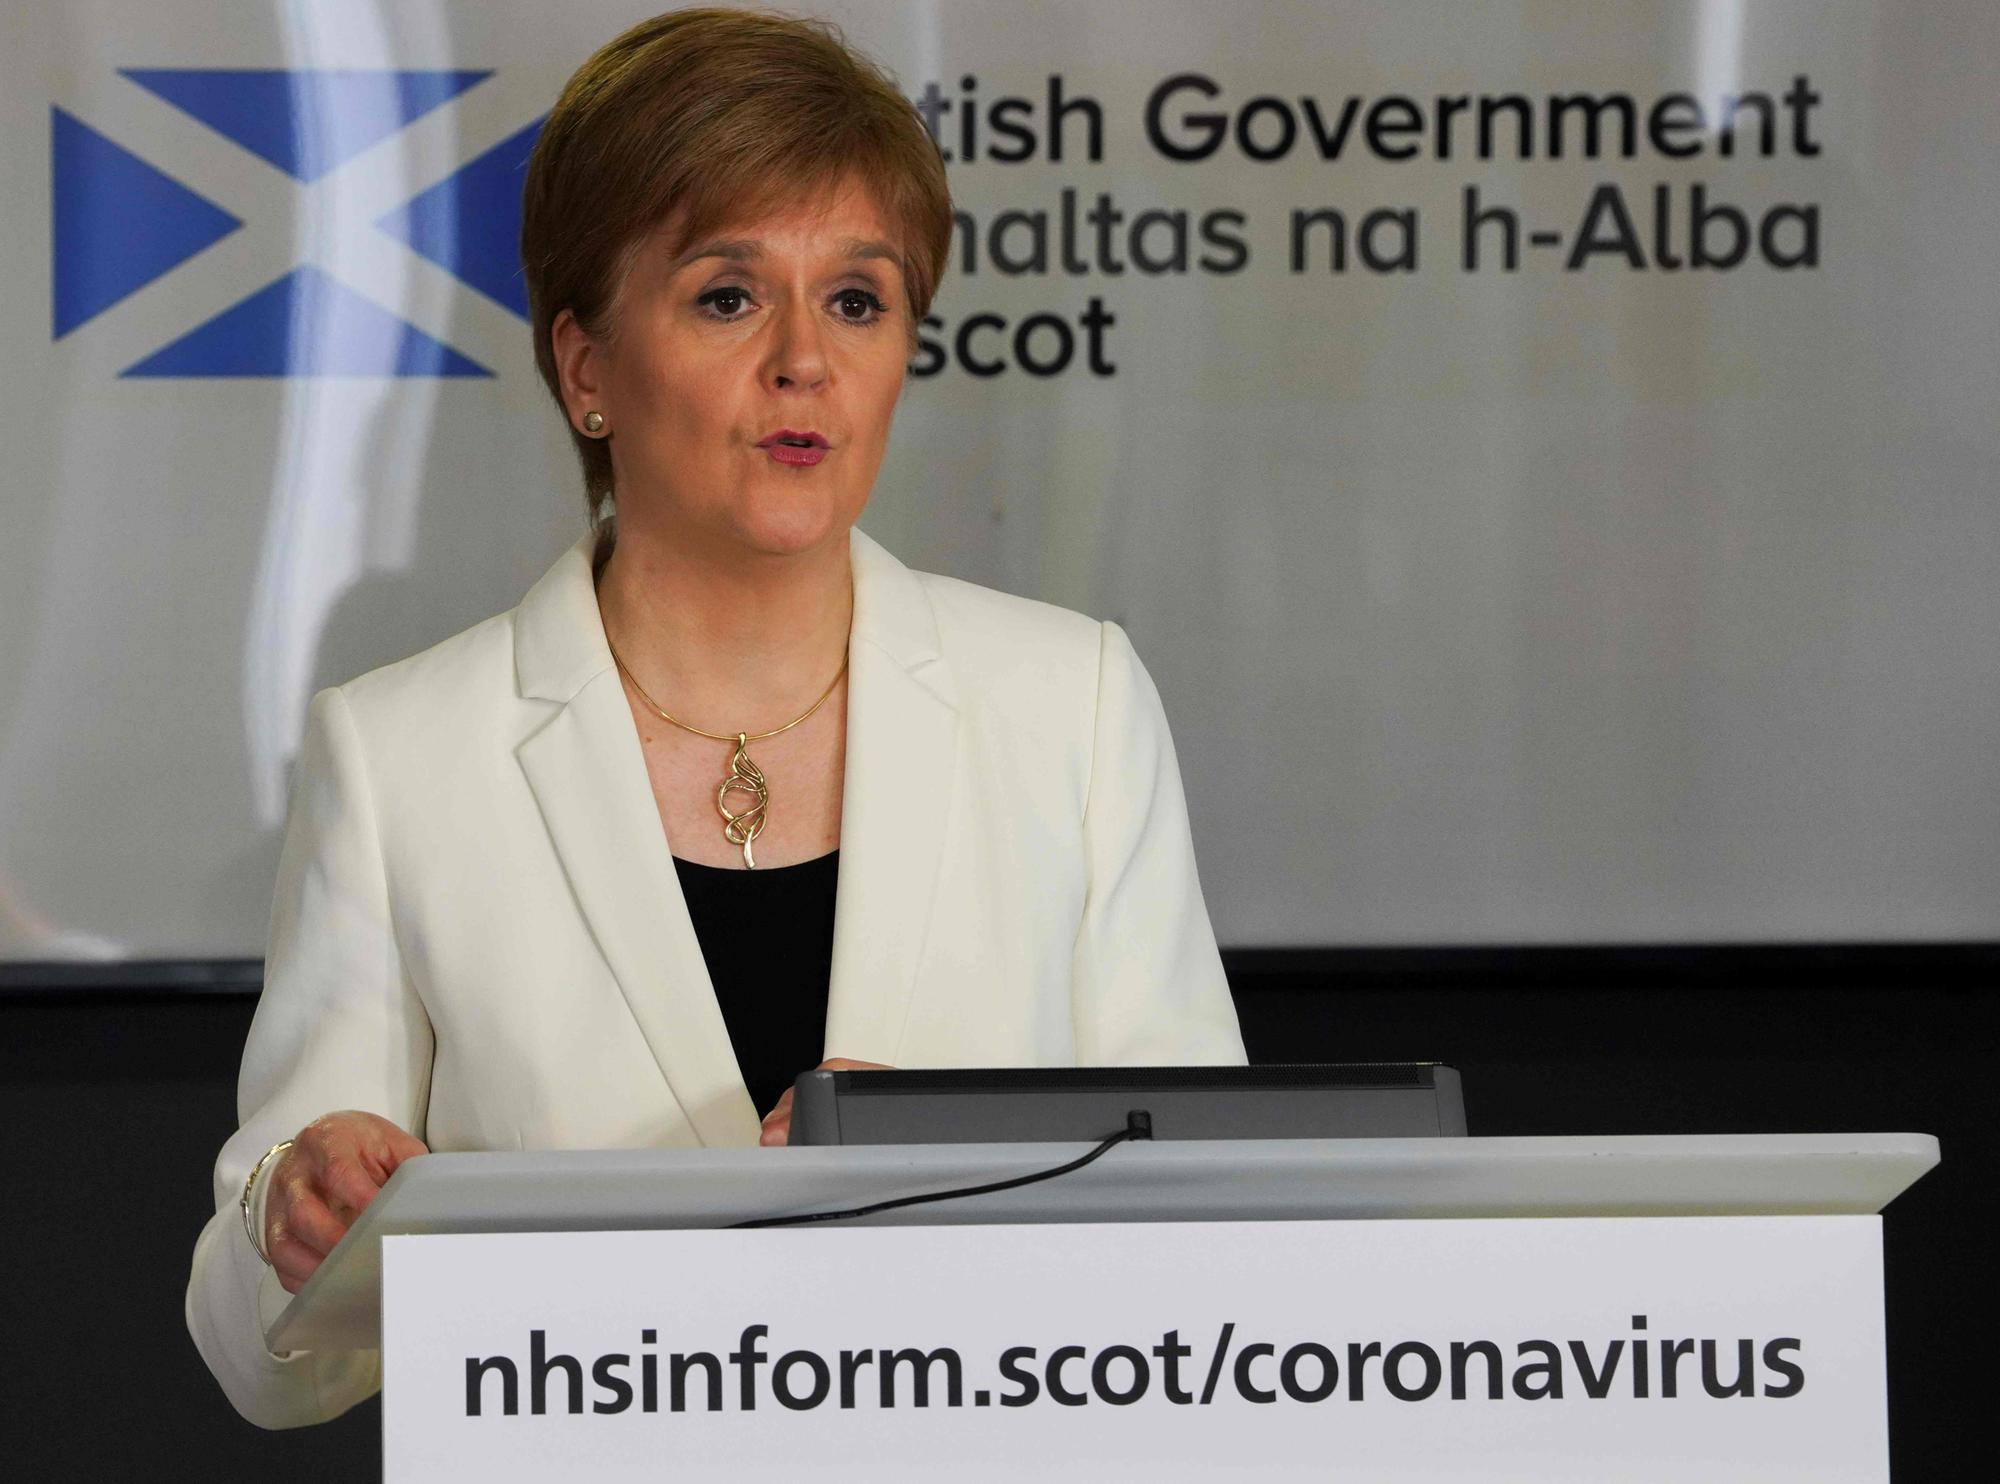 Nicola Sturgeon: this virus will not peak in a week, summer holidays unlikely to happen as normal